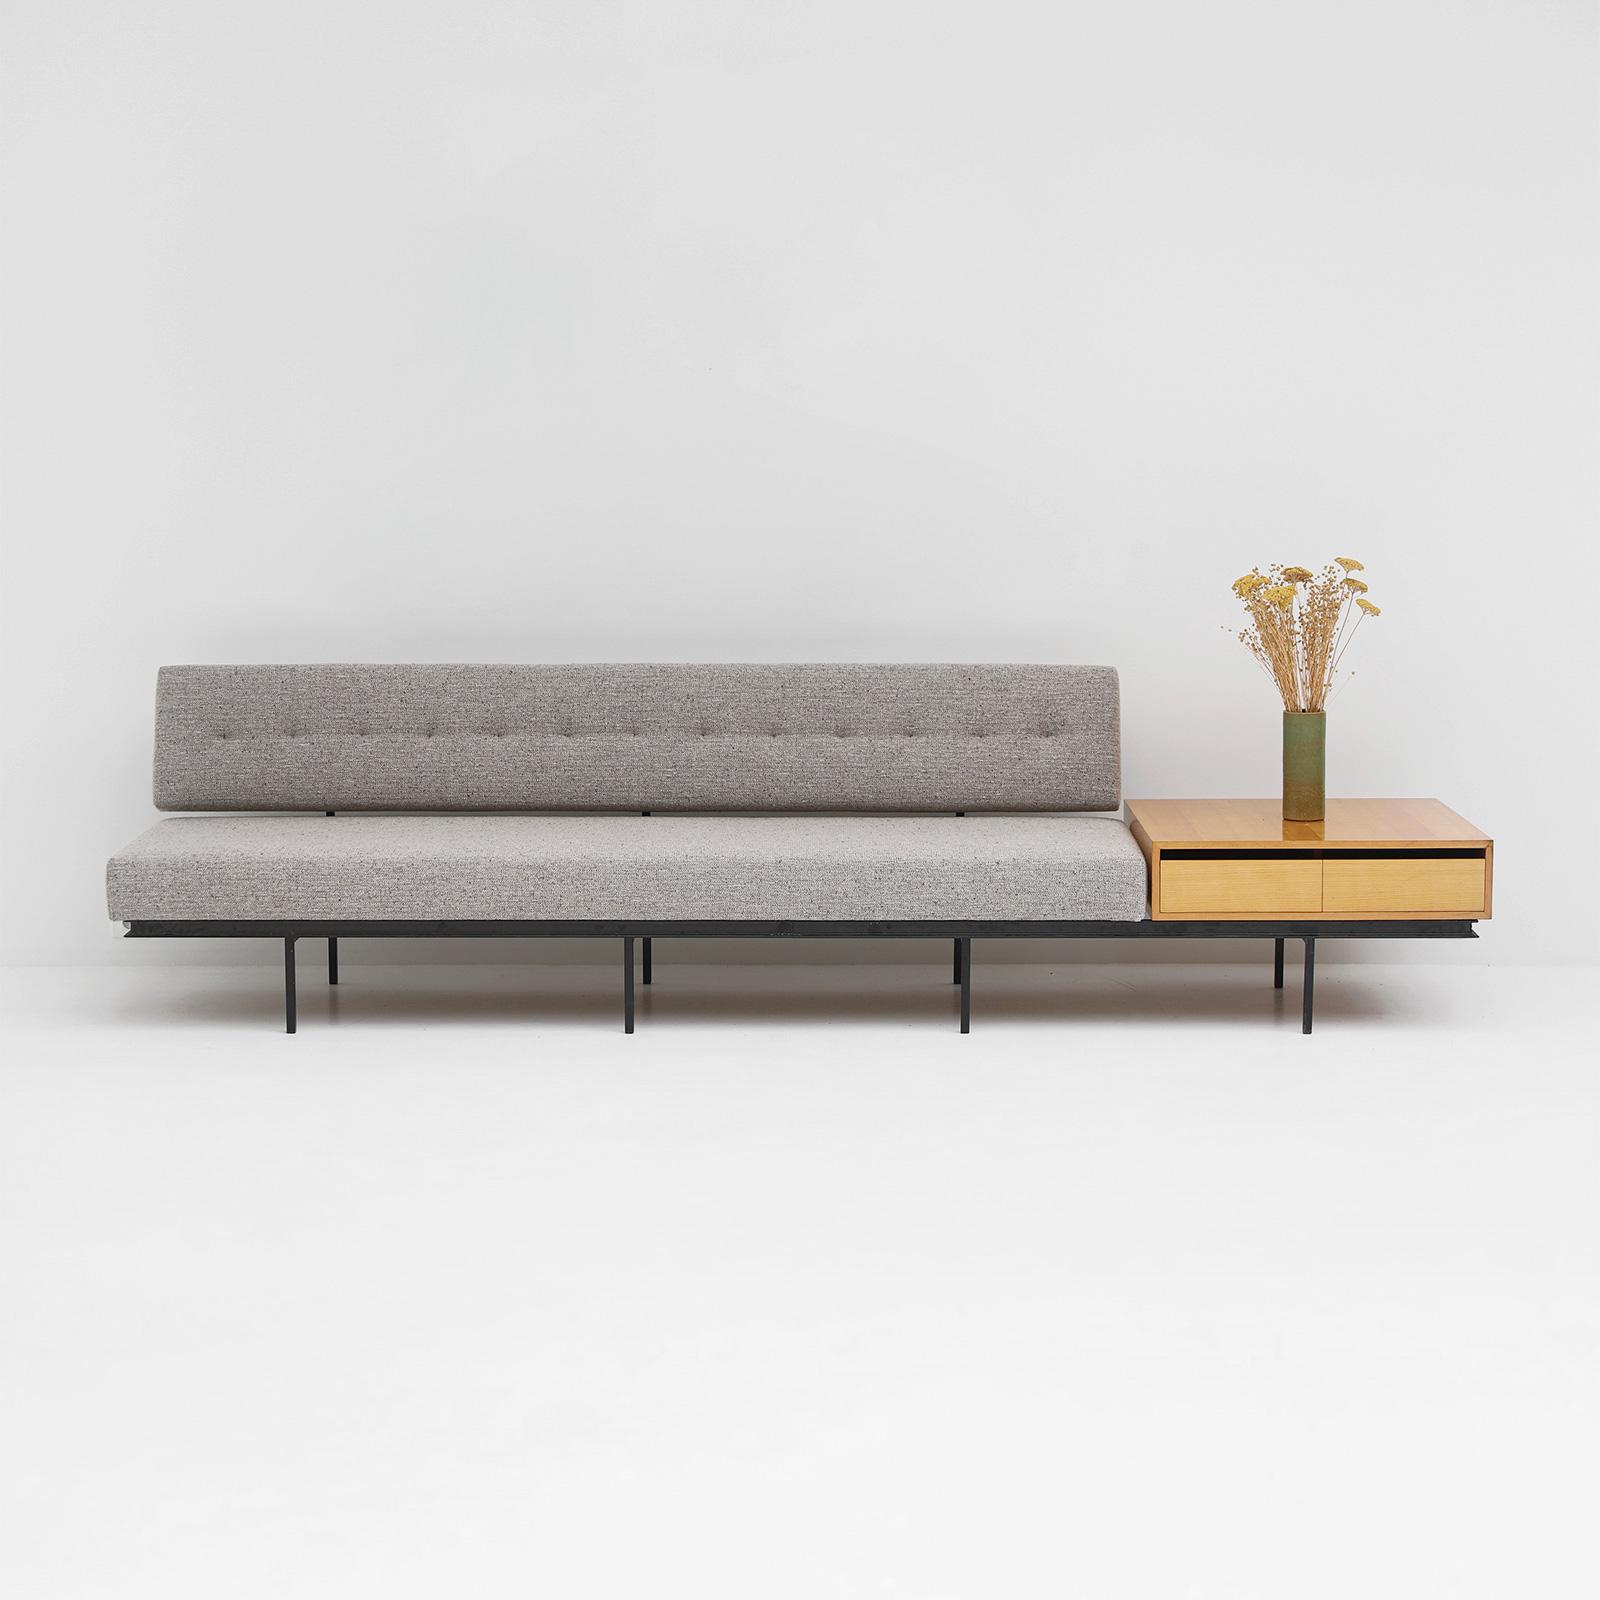 Florence Knoll Sofa & Cabinet